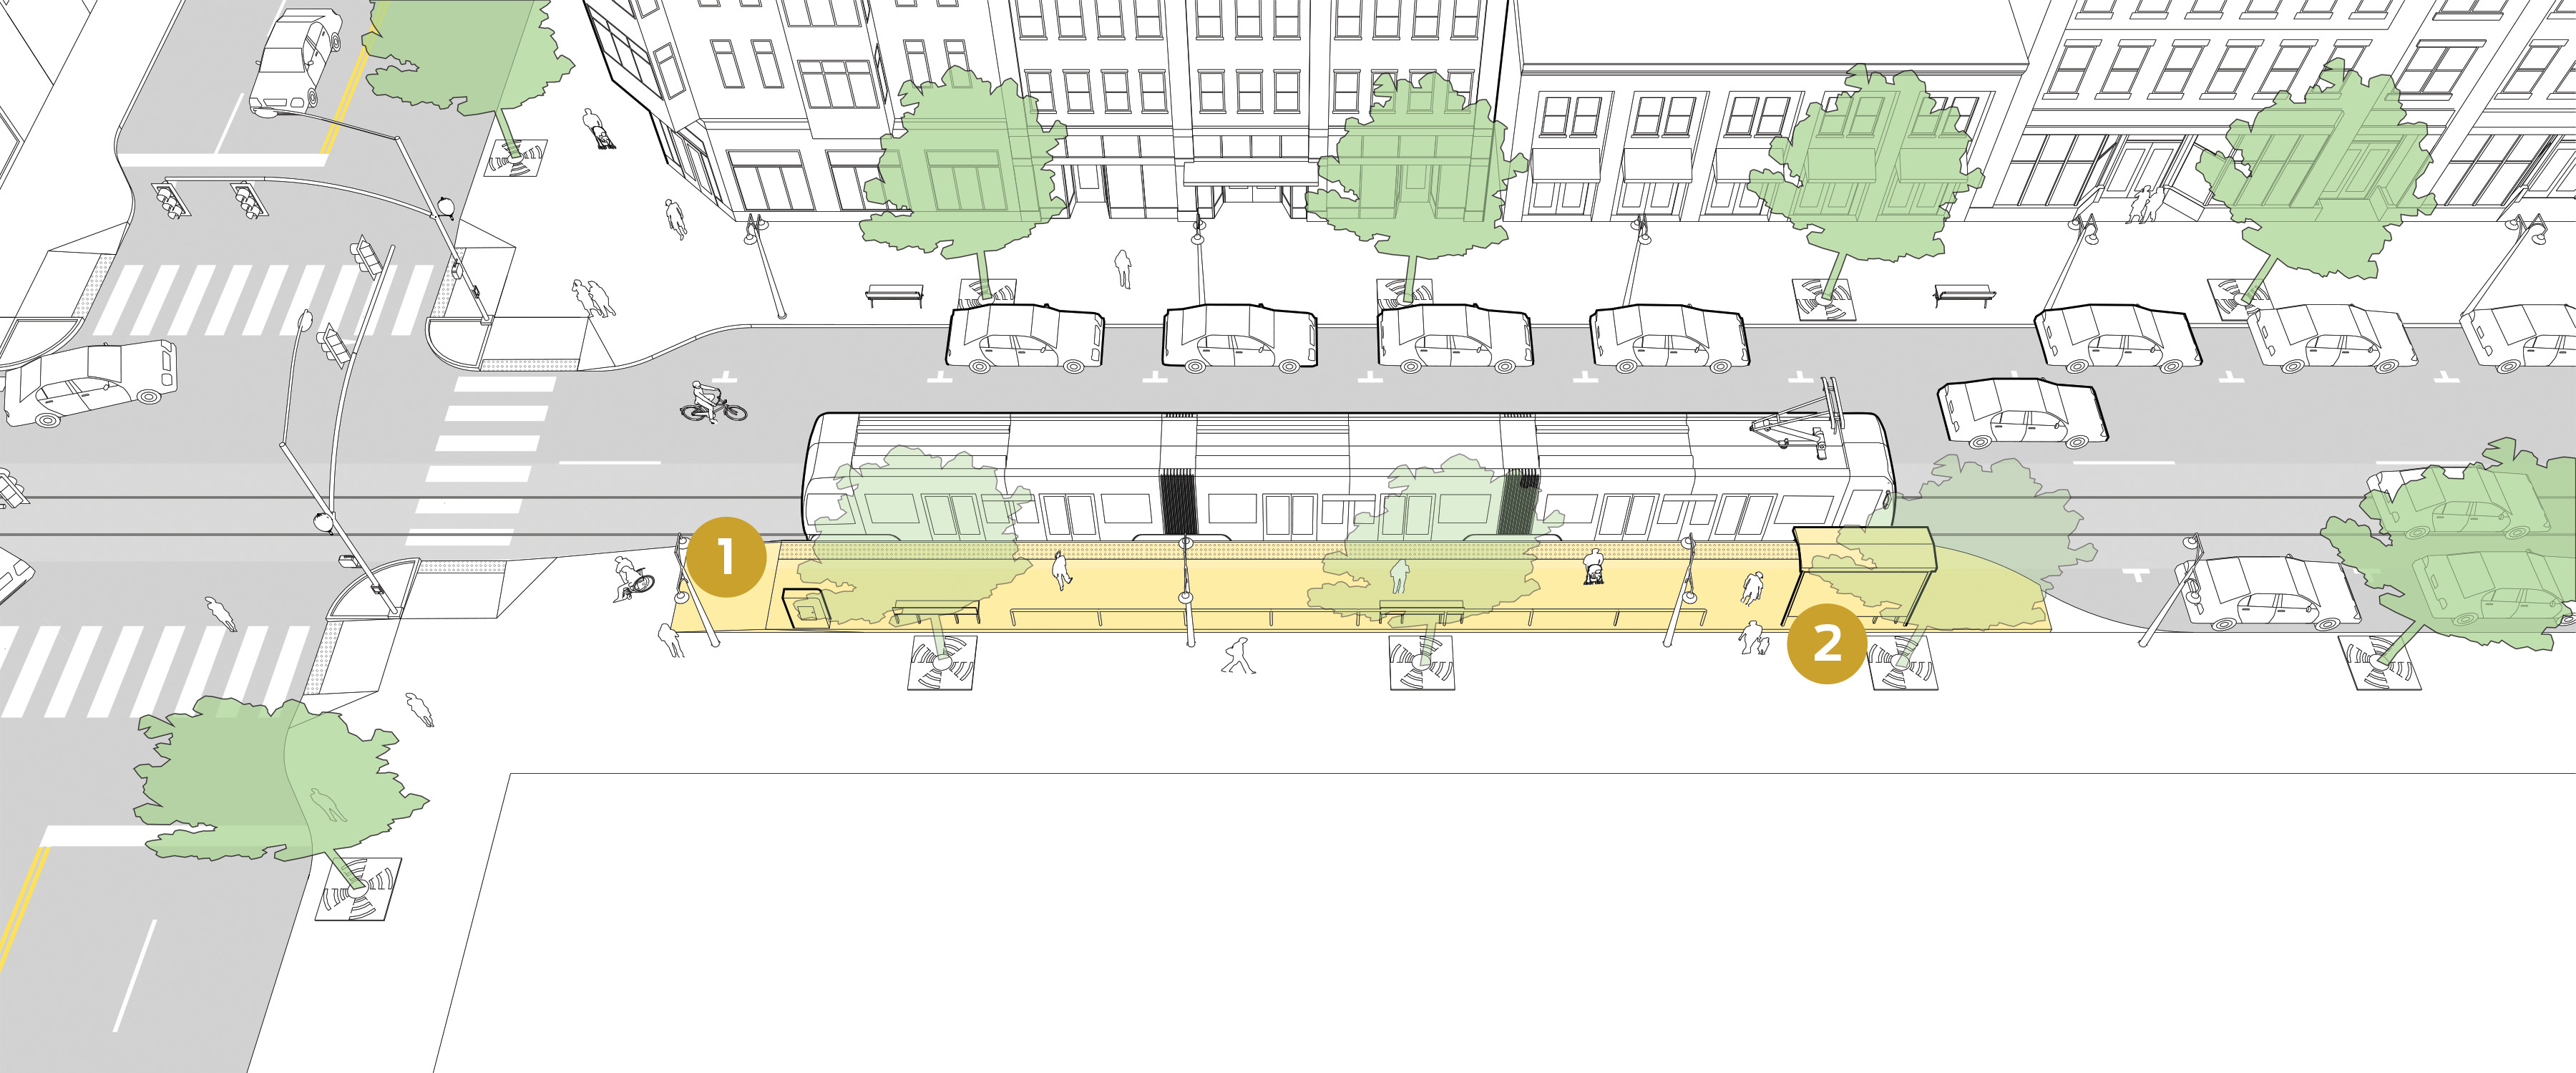 Level-board streetcar